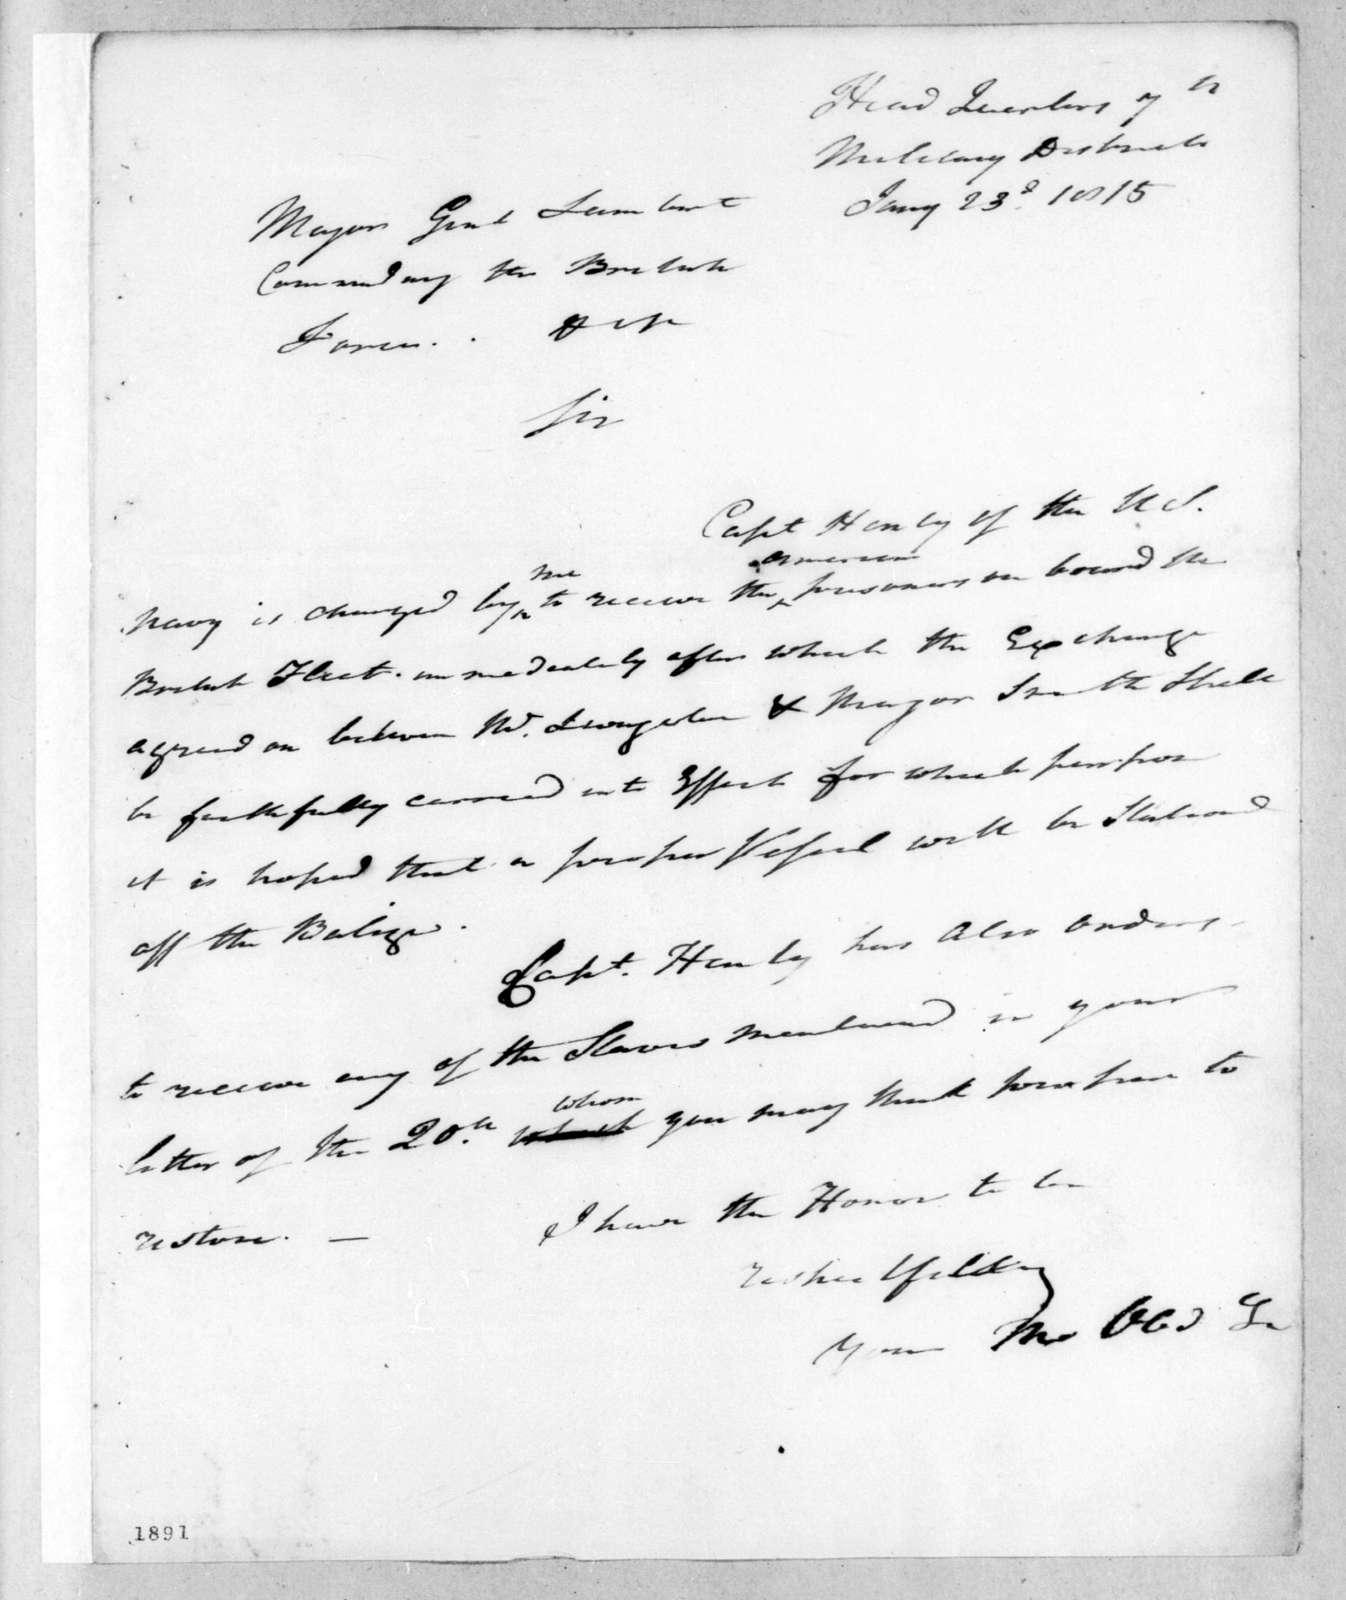 Andrew Jackson to John Lambert, January 23, 1815